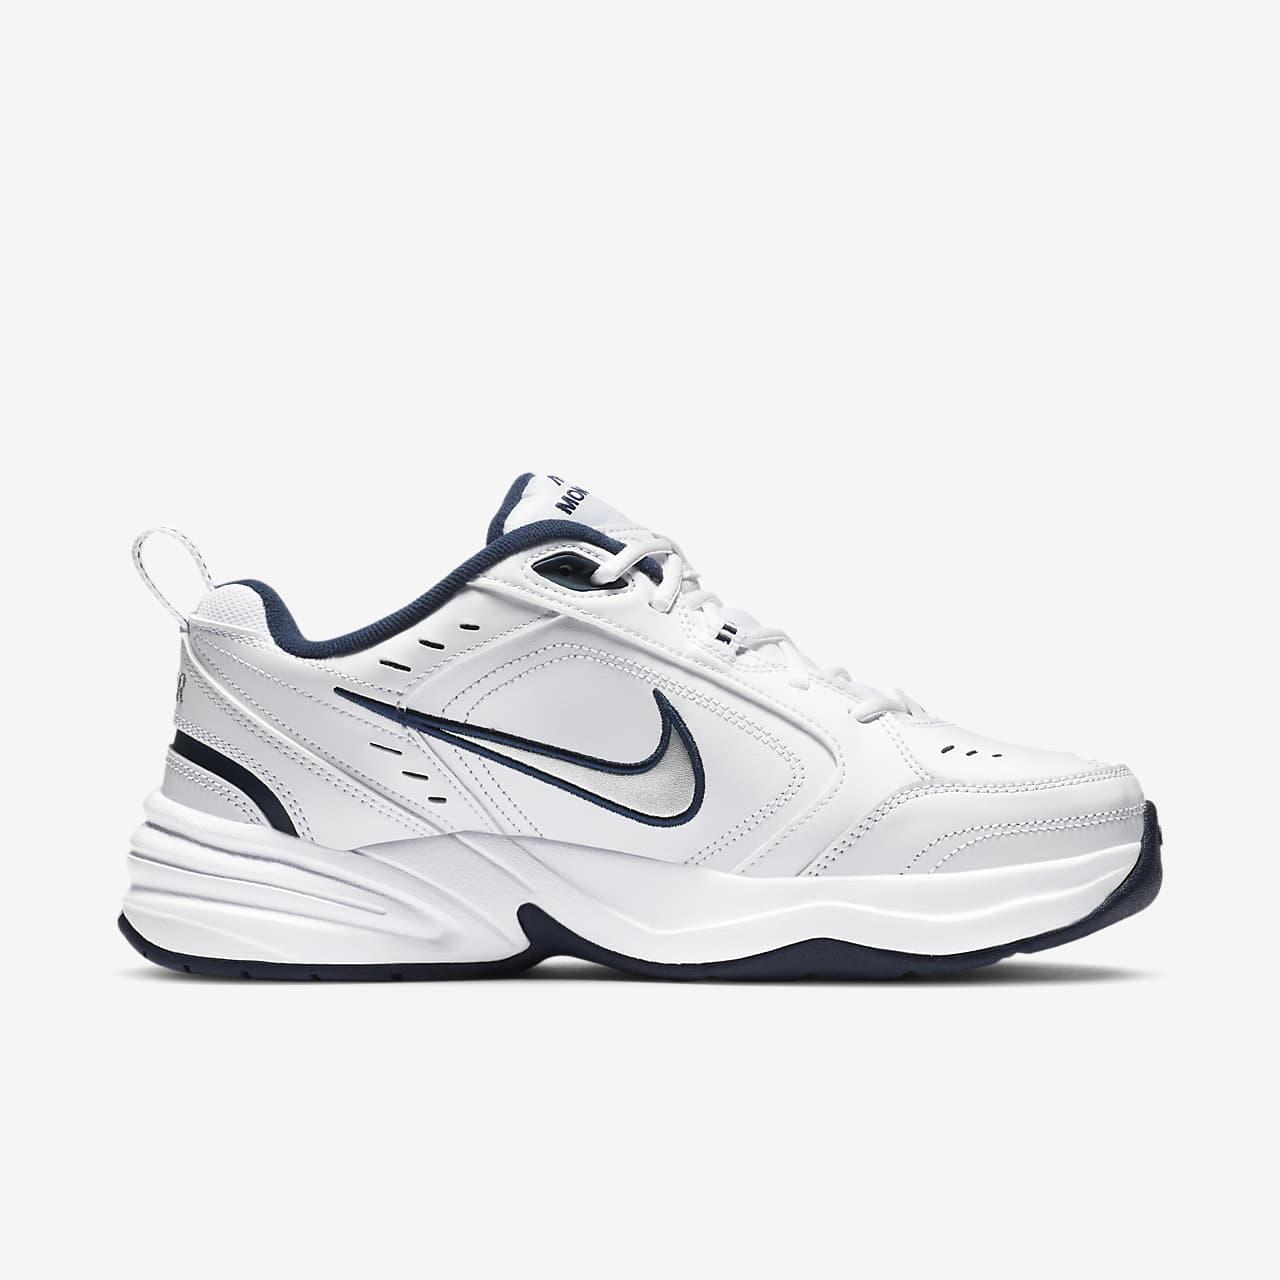 san francisco e94e5 00dba ... Livsstils- och gymsko Nike Air Monarch IV